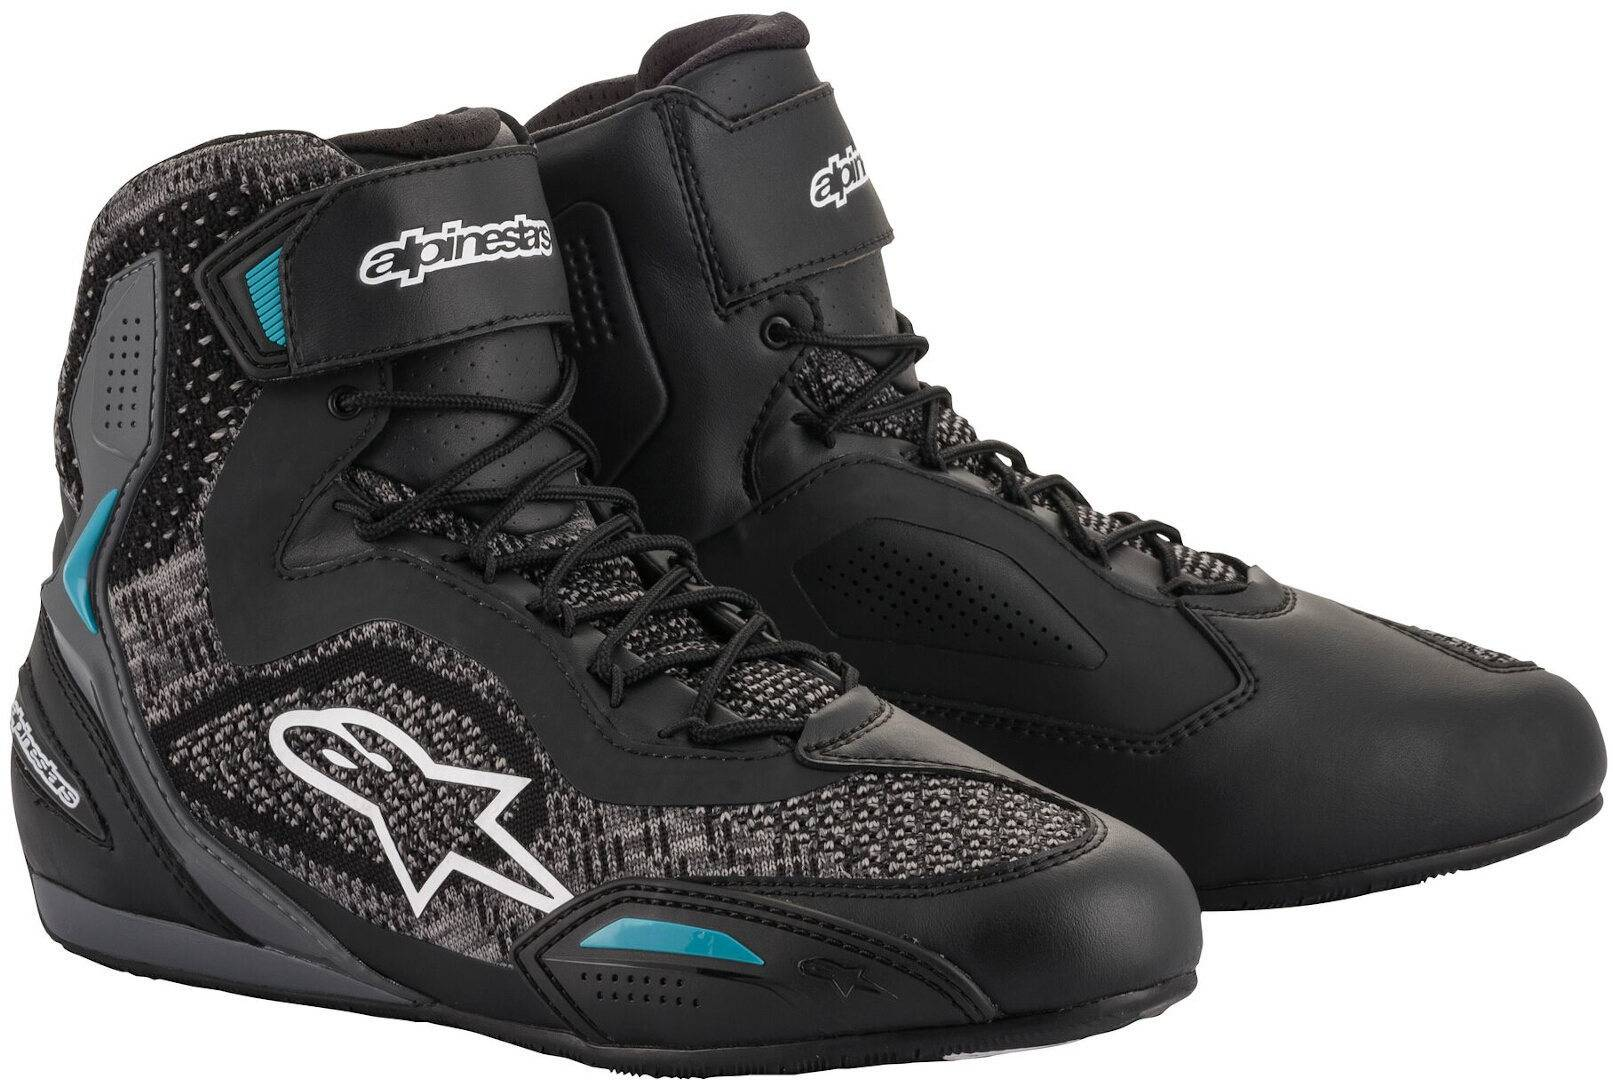 Alpinestars Stella Faster 3 Rideknit Chaussures de moto dames Noir Blanc Bleu taille : 43